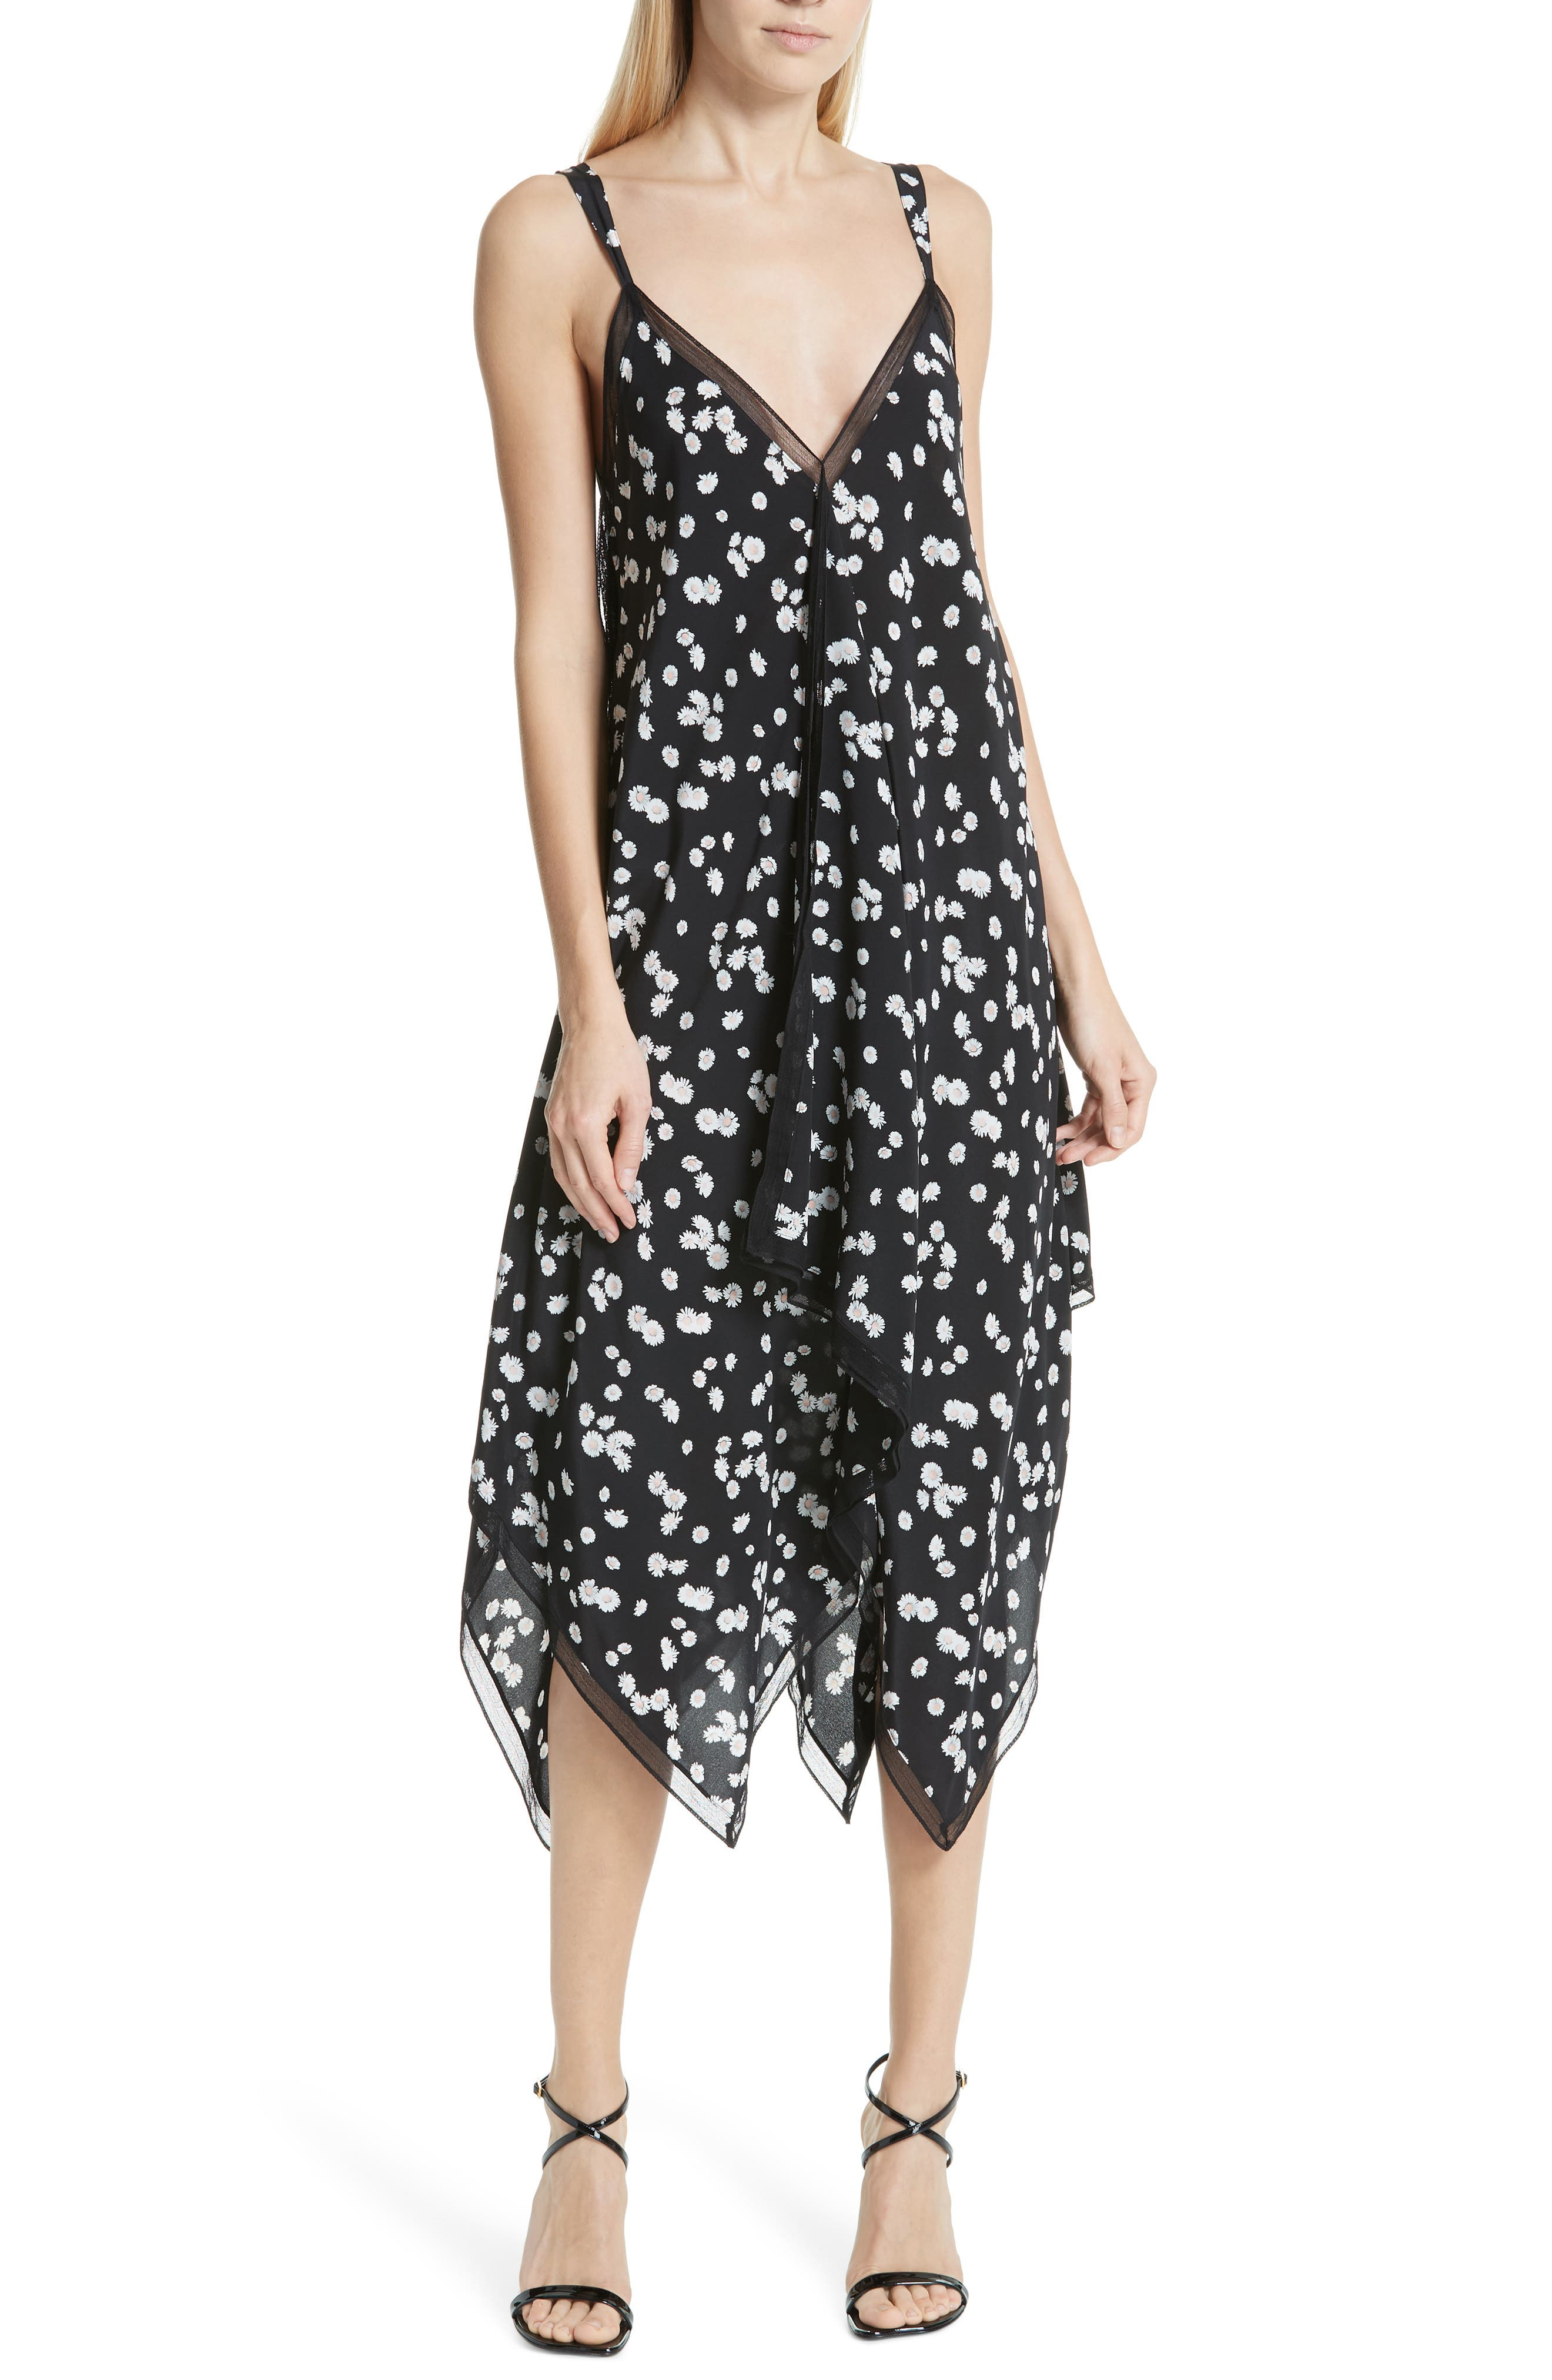 Jason Wu Spring Daisy Handkerchief Hem Dress, Black